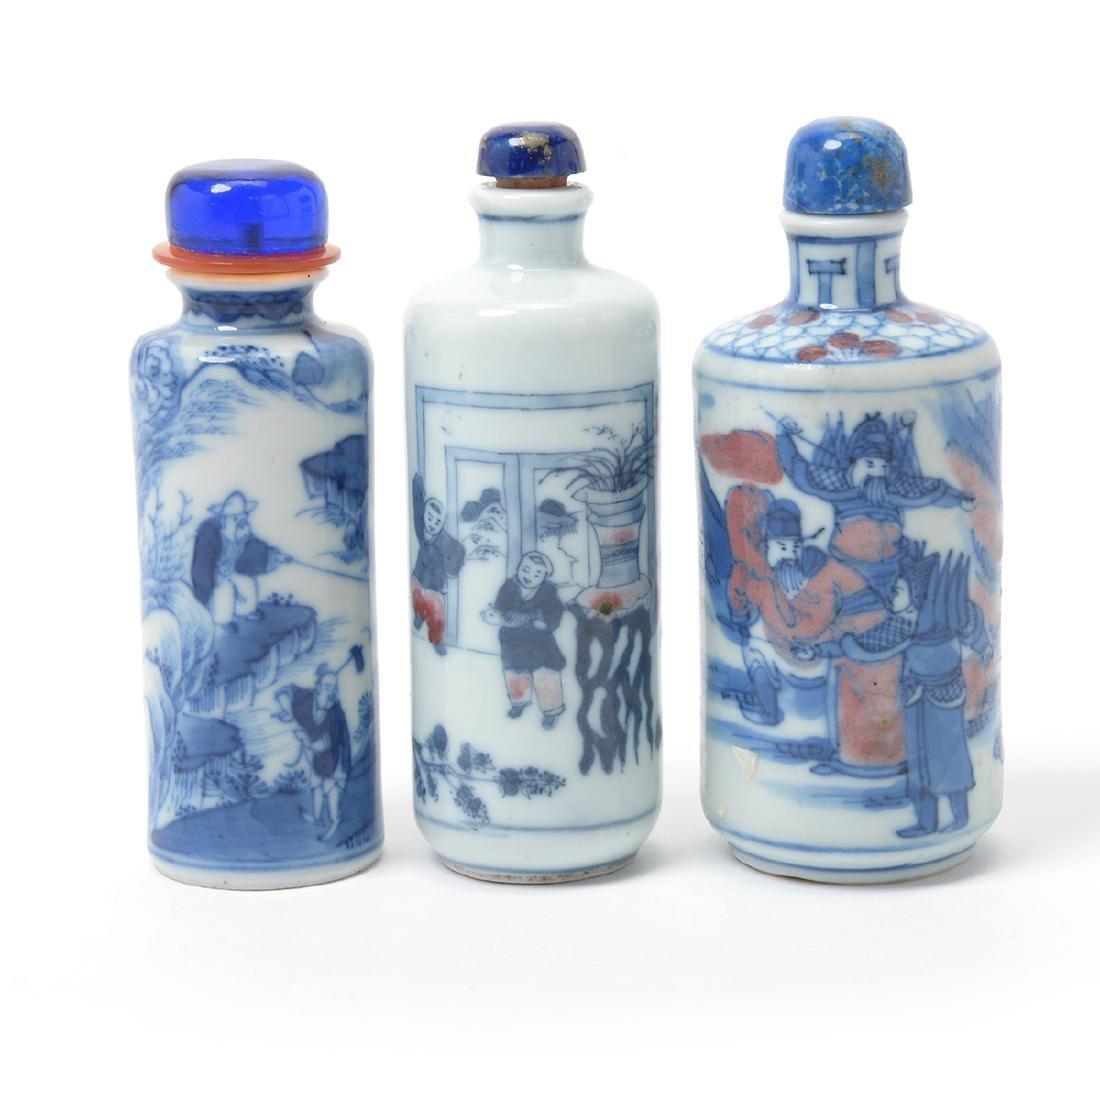 Three Underglaze Blue Porcelain Snuff Bottles, 19th C